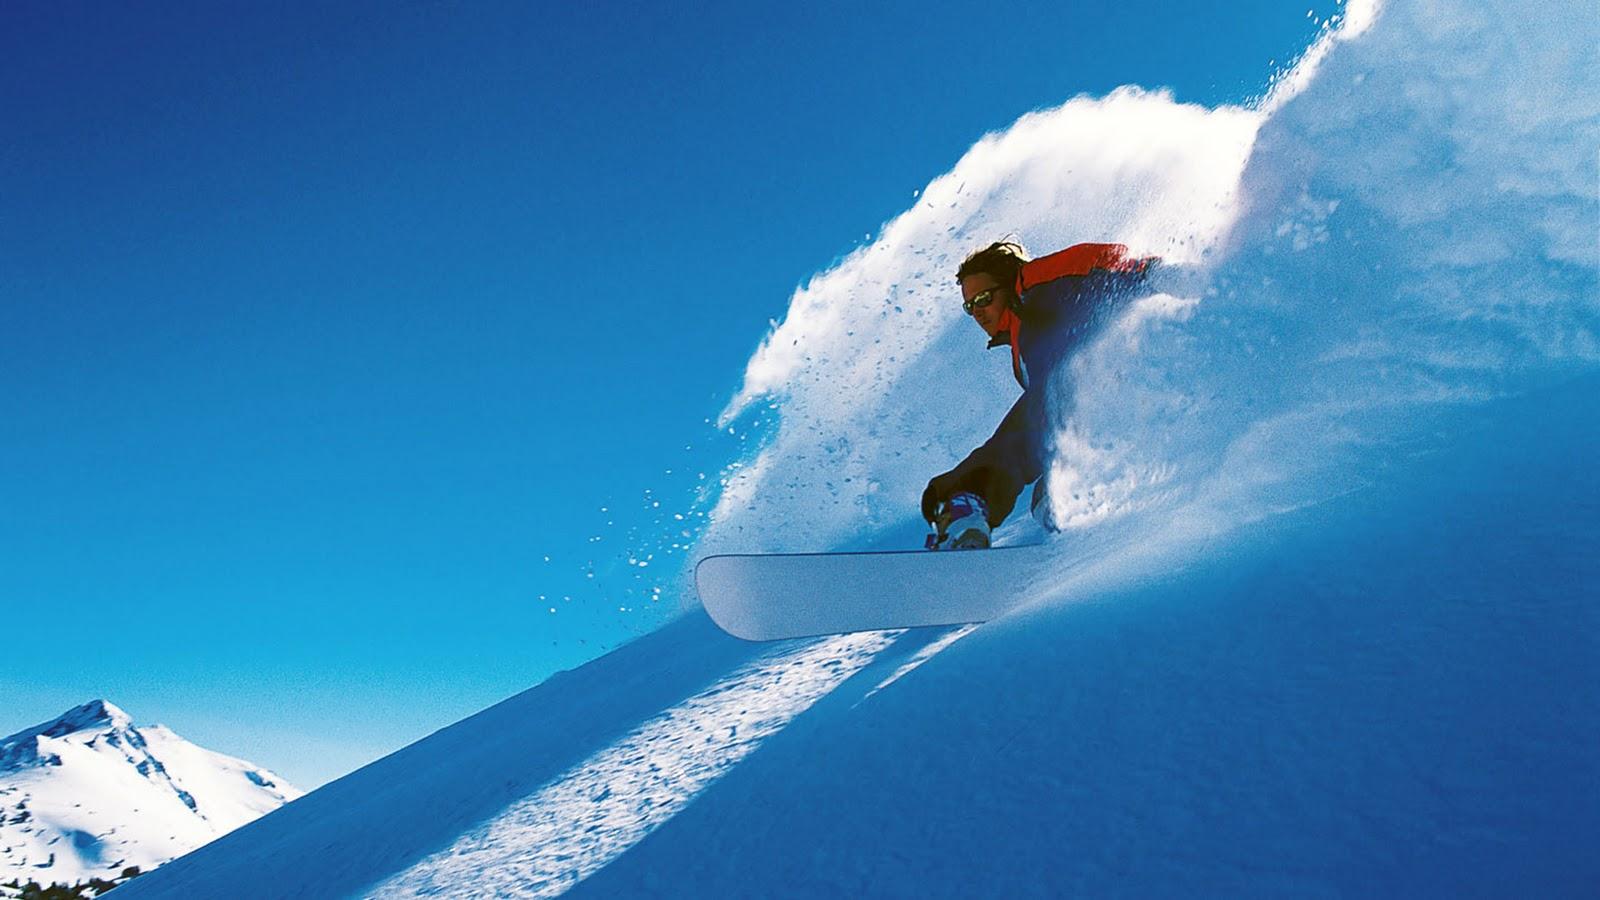 Free Download Snowboarding Wallpapers Hd Wallpapers Desktop